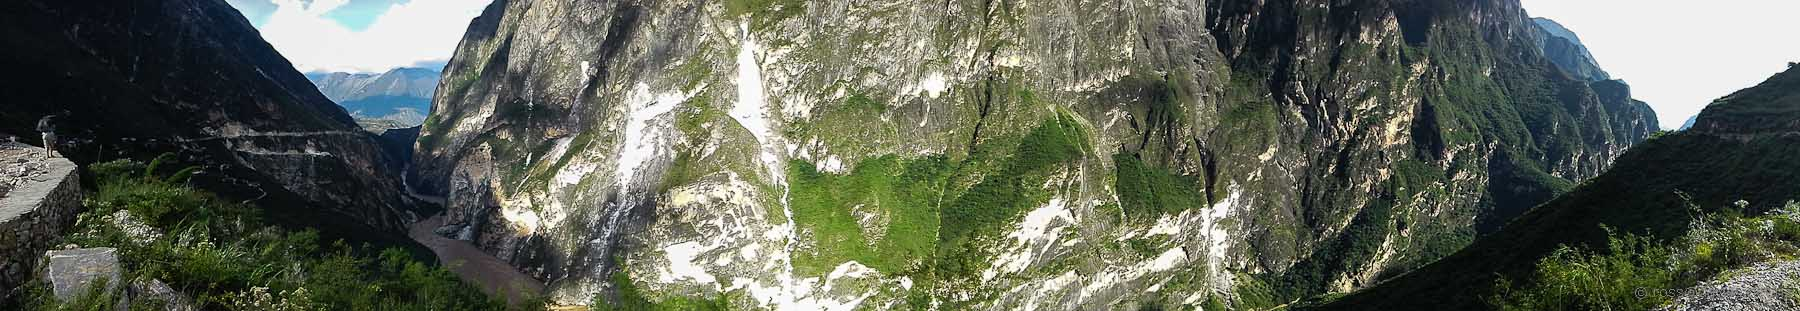 Tiger Leaping Gorge near Walnut Garden